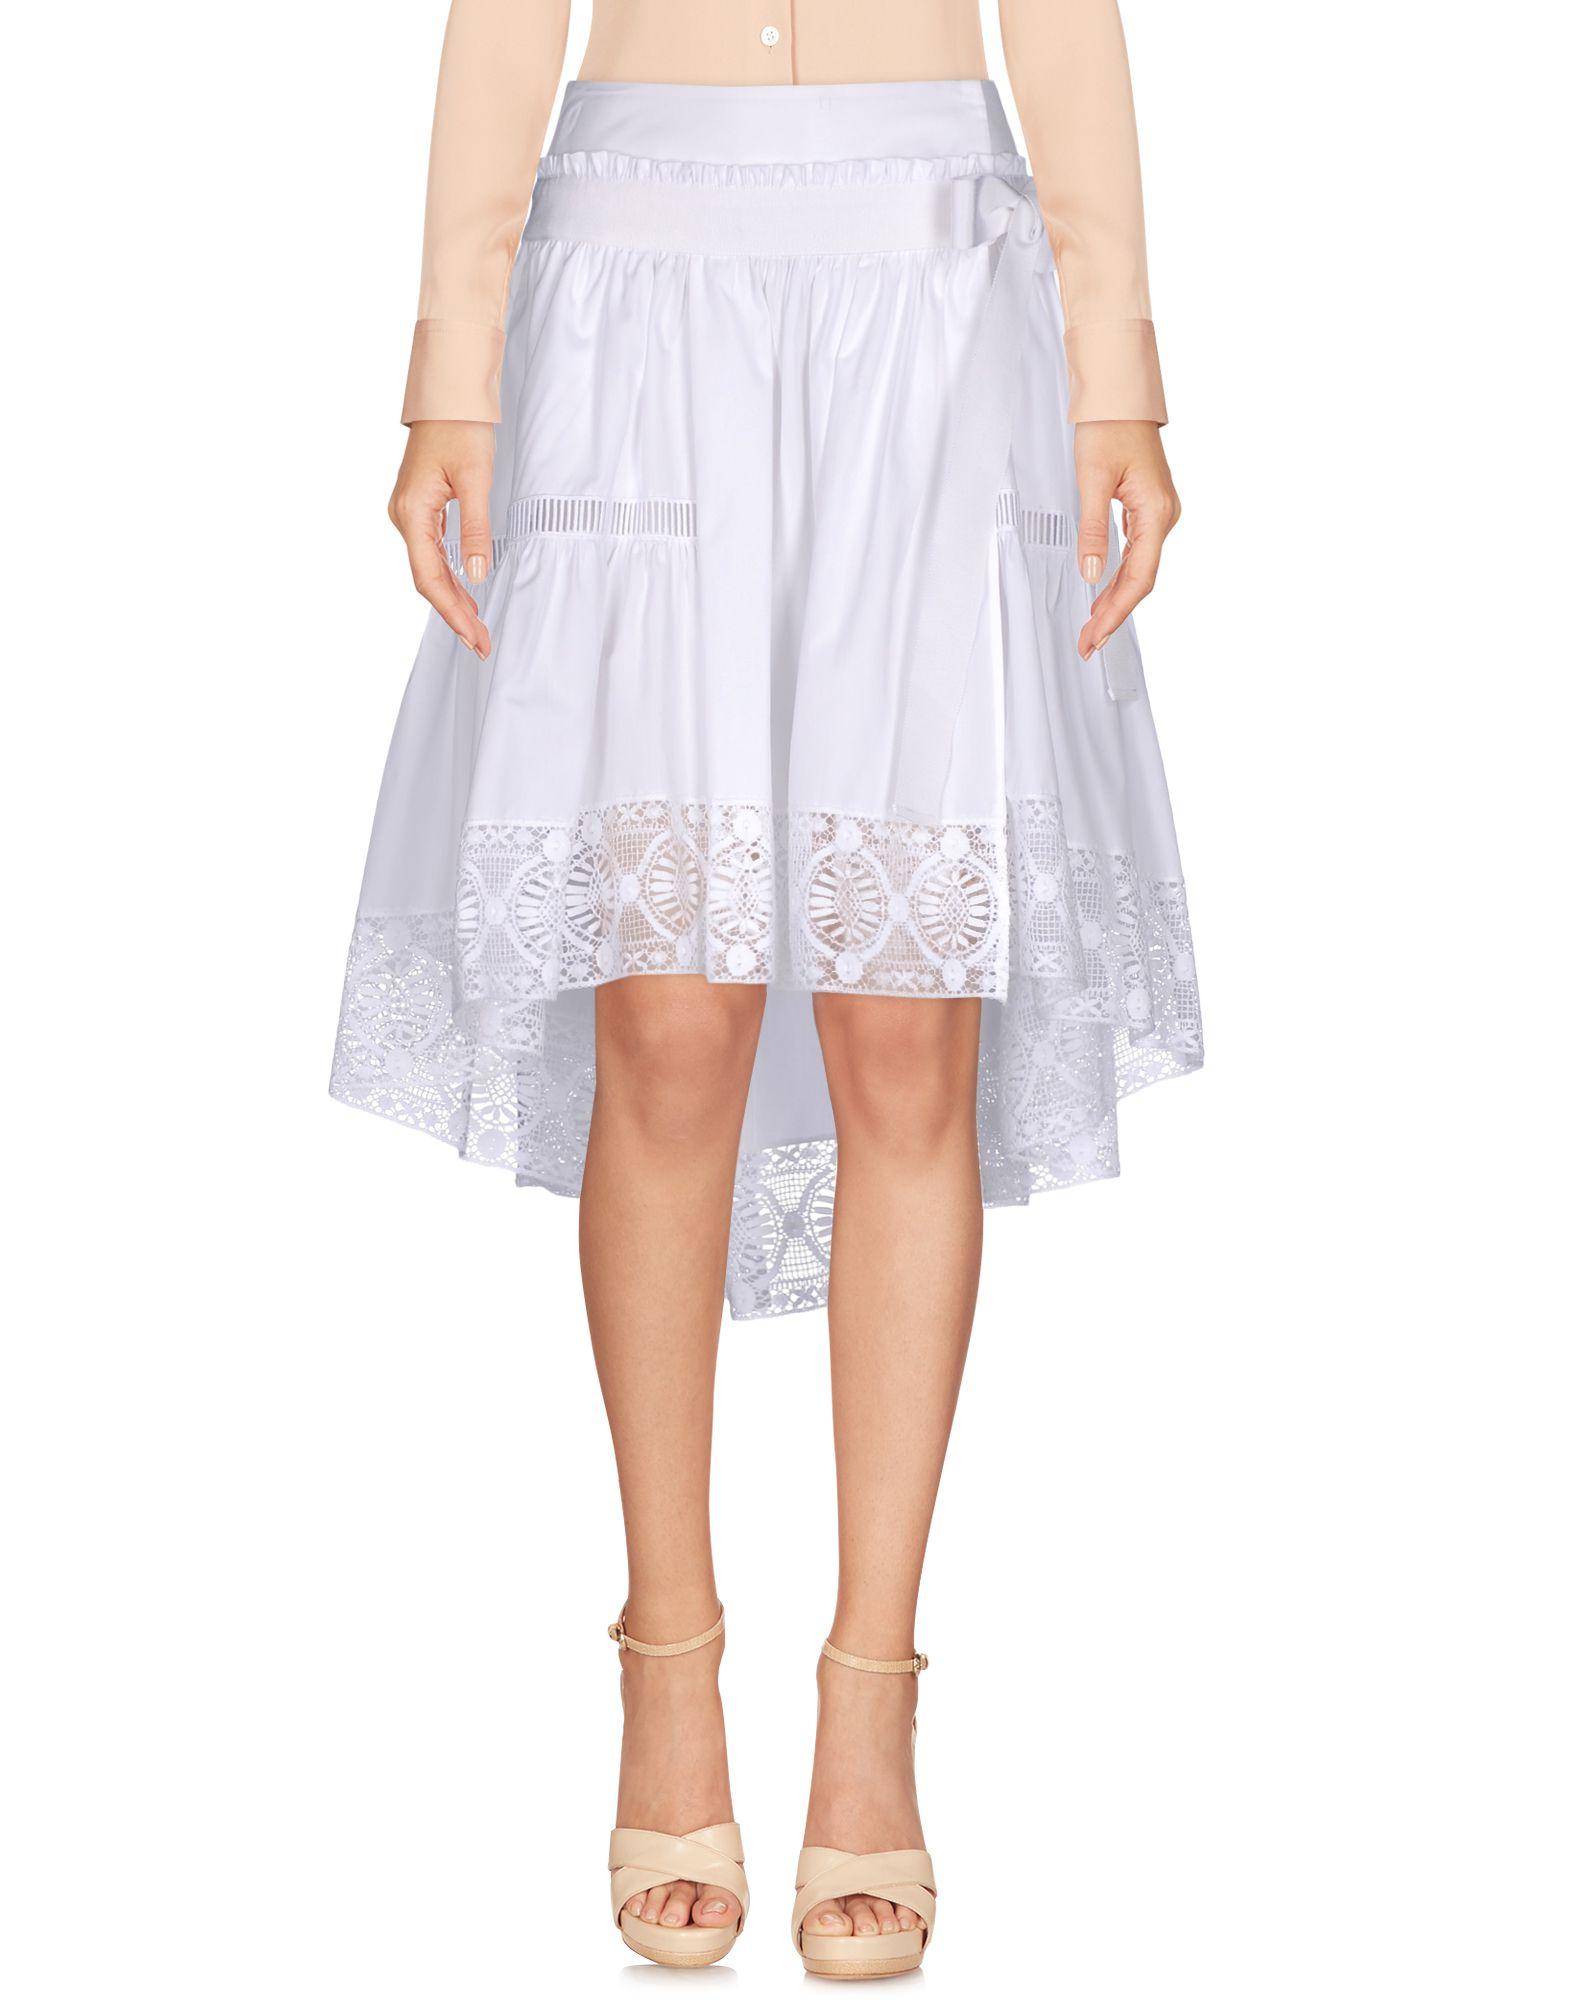 ALBERTA FERRETTI Damen Midirock Farbe Weiß Größe 6 jetztbilligerkaufen